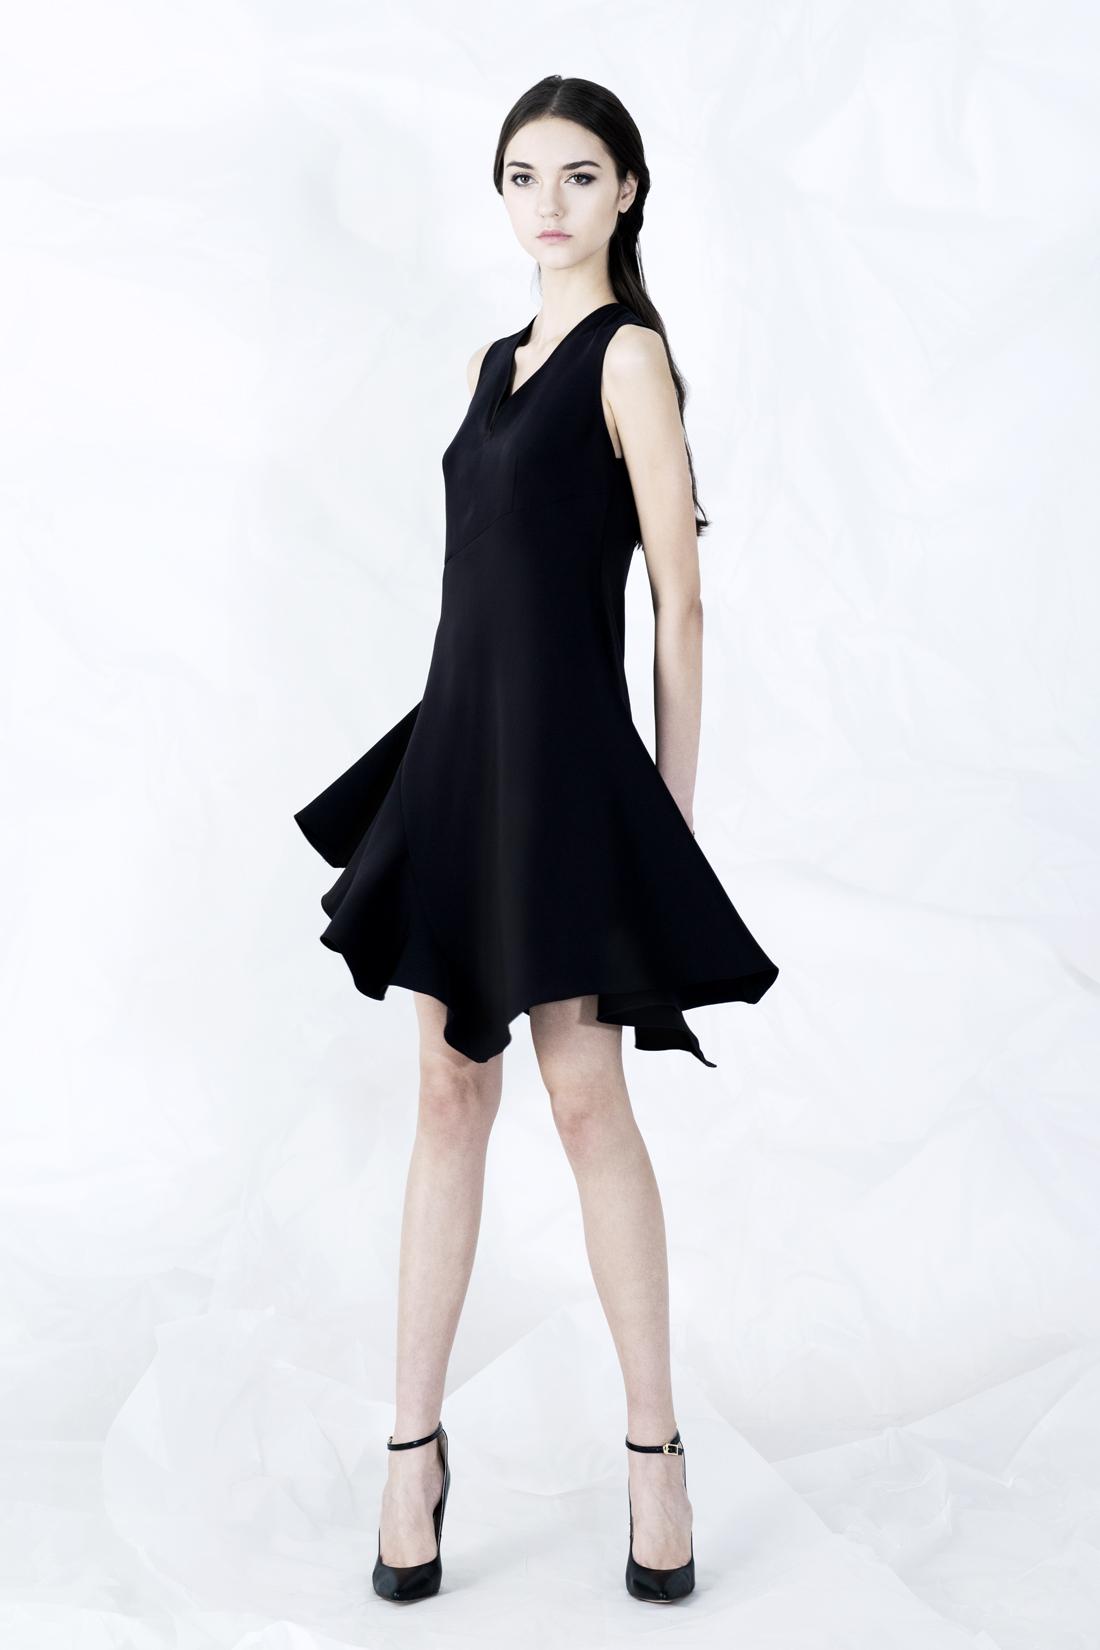 sr-vol02-geyta dress.jpg